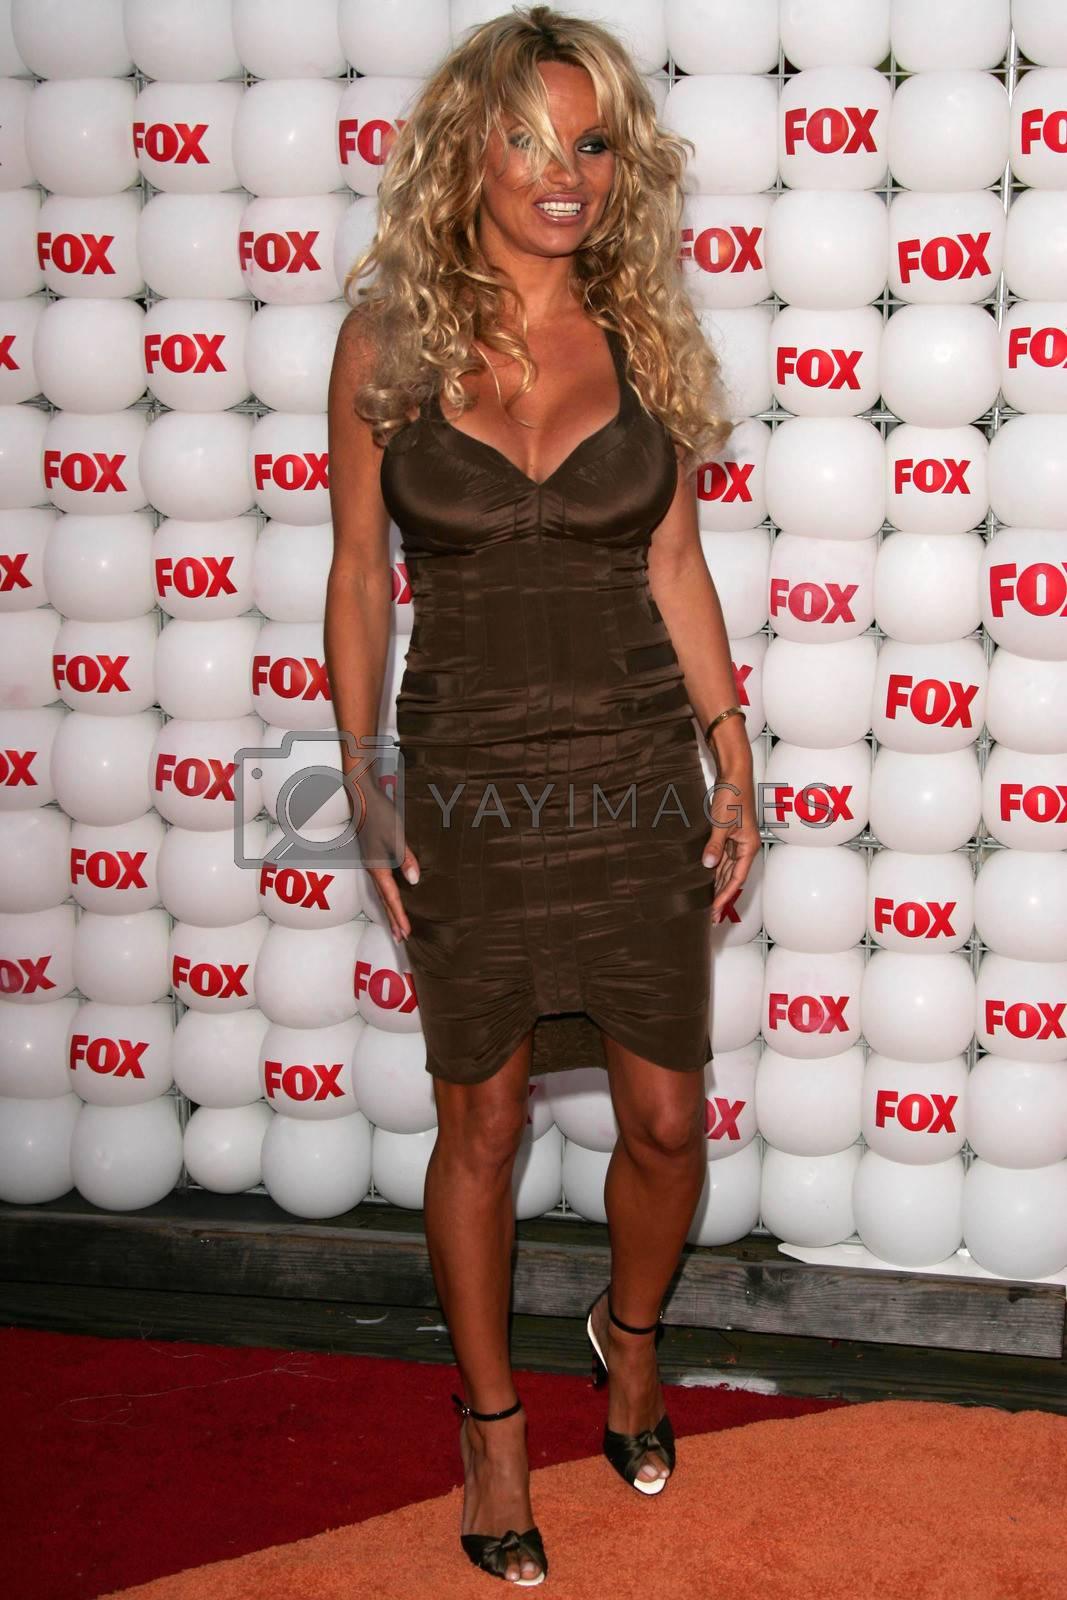 Pamela Anderson At the FOX Summer 2005 TCA Party, Santa Monica Pier, Santa Monica, CA 07-29-05